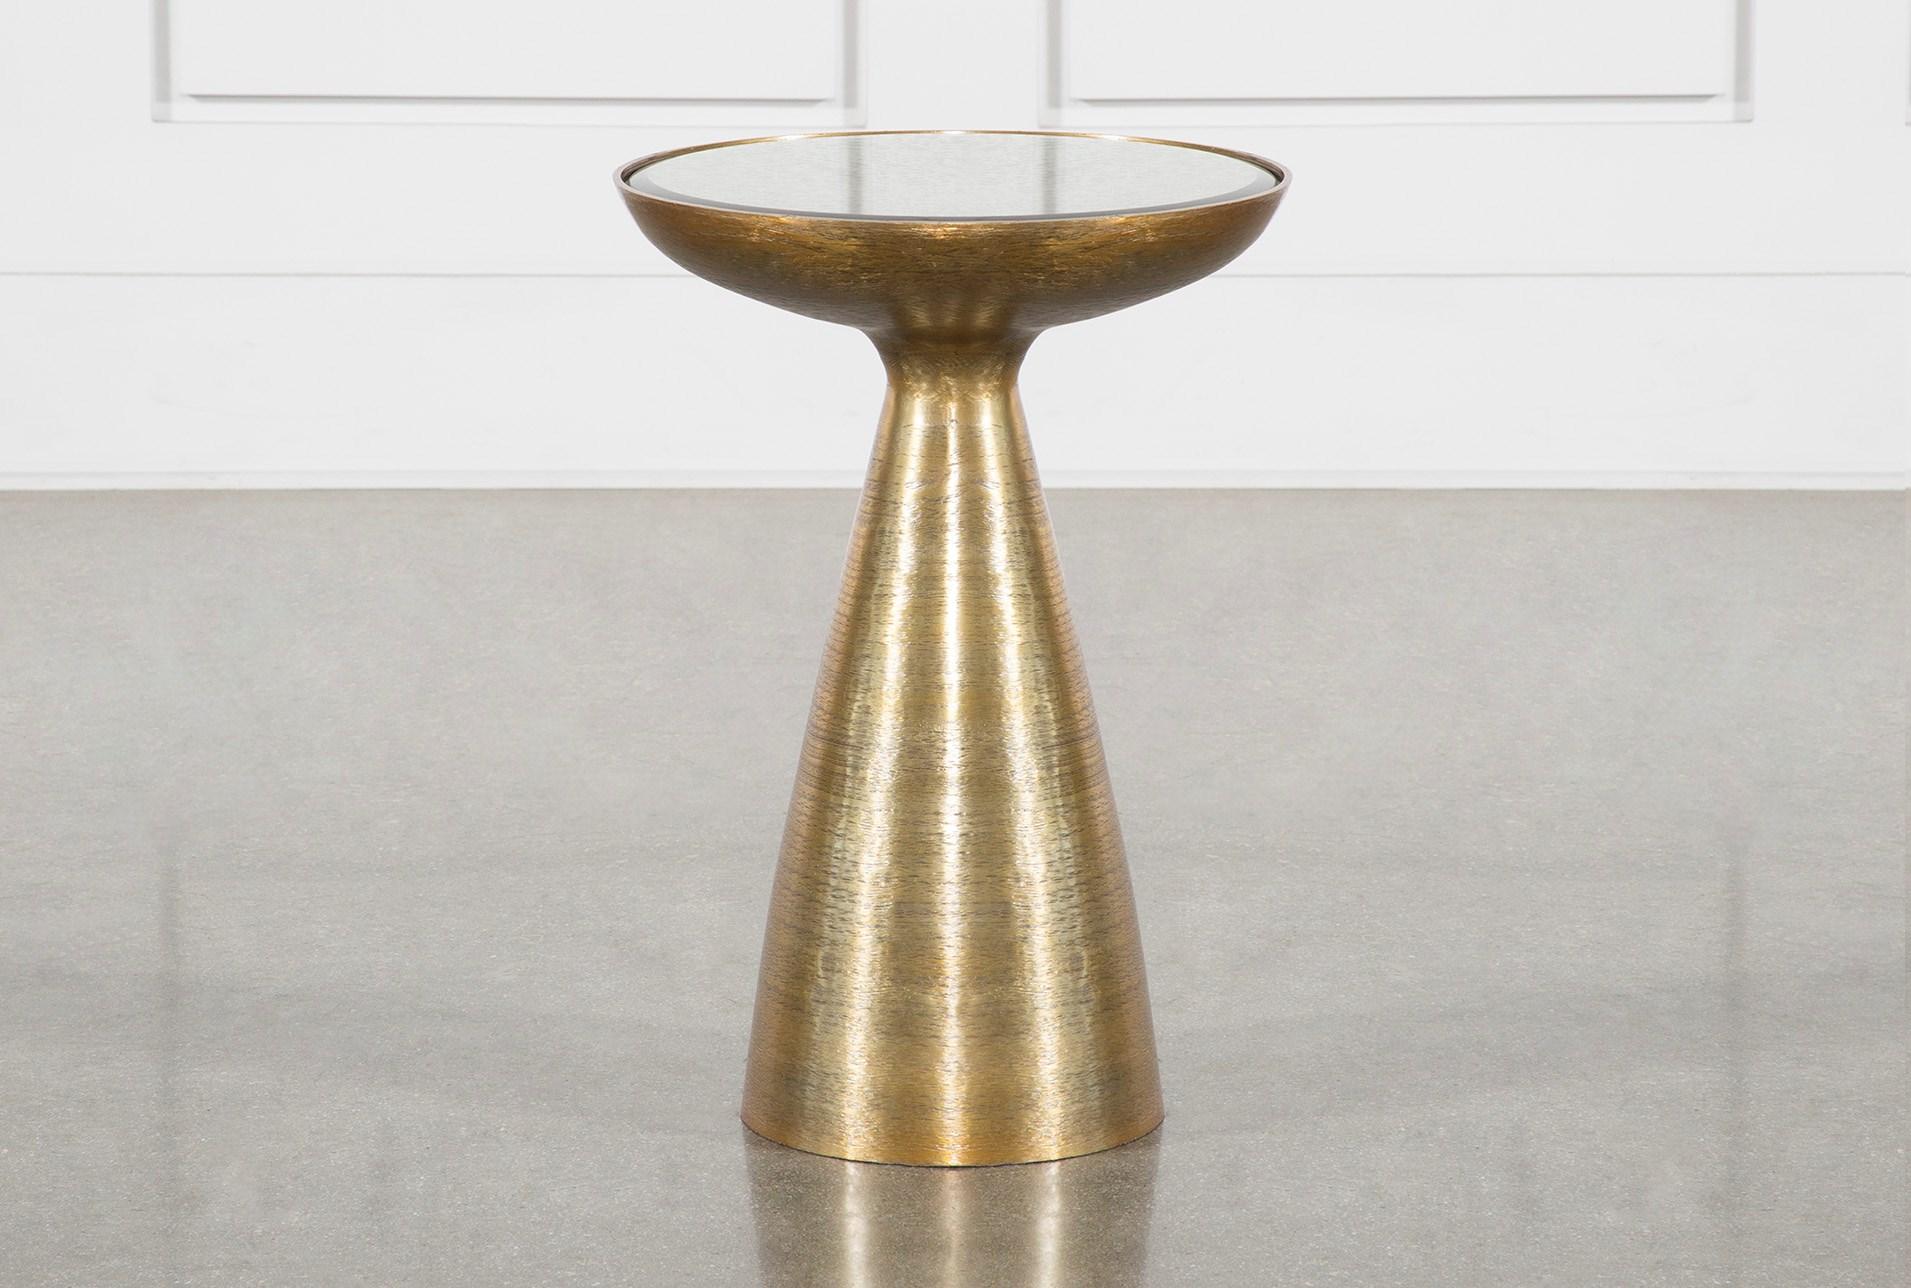 Marllie Mod Pedestal Accent Table Living Spaces